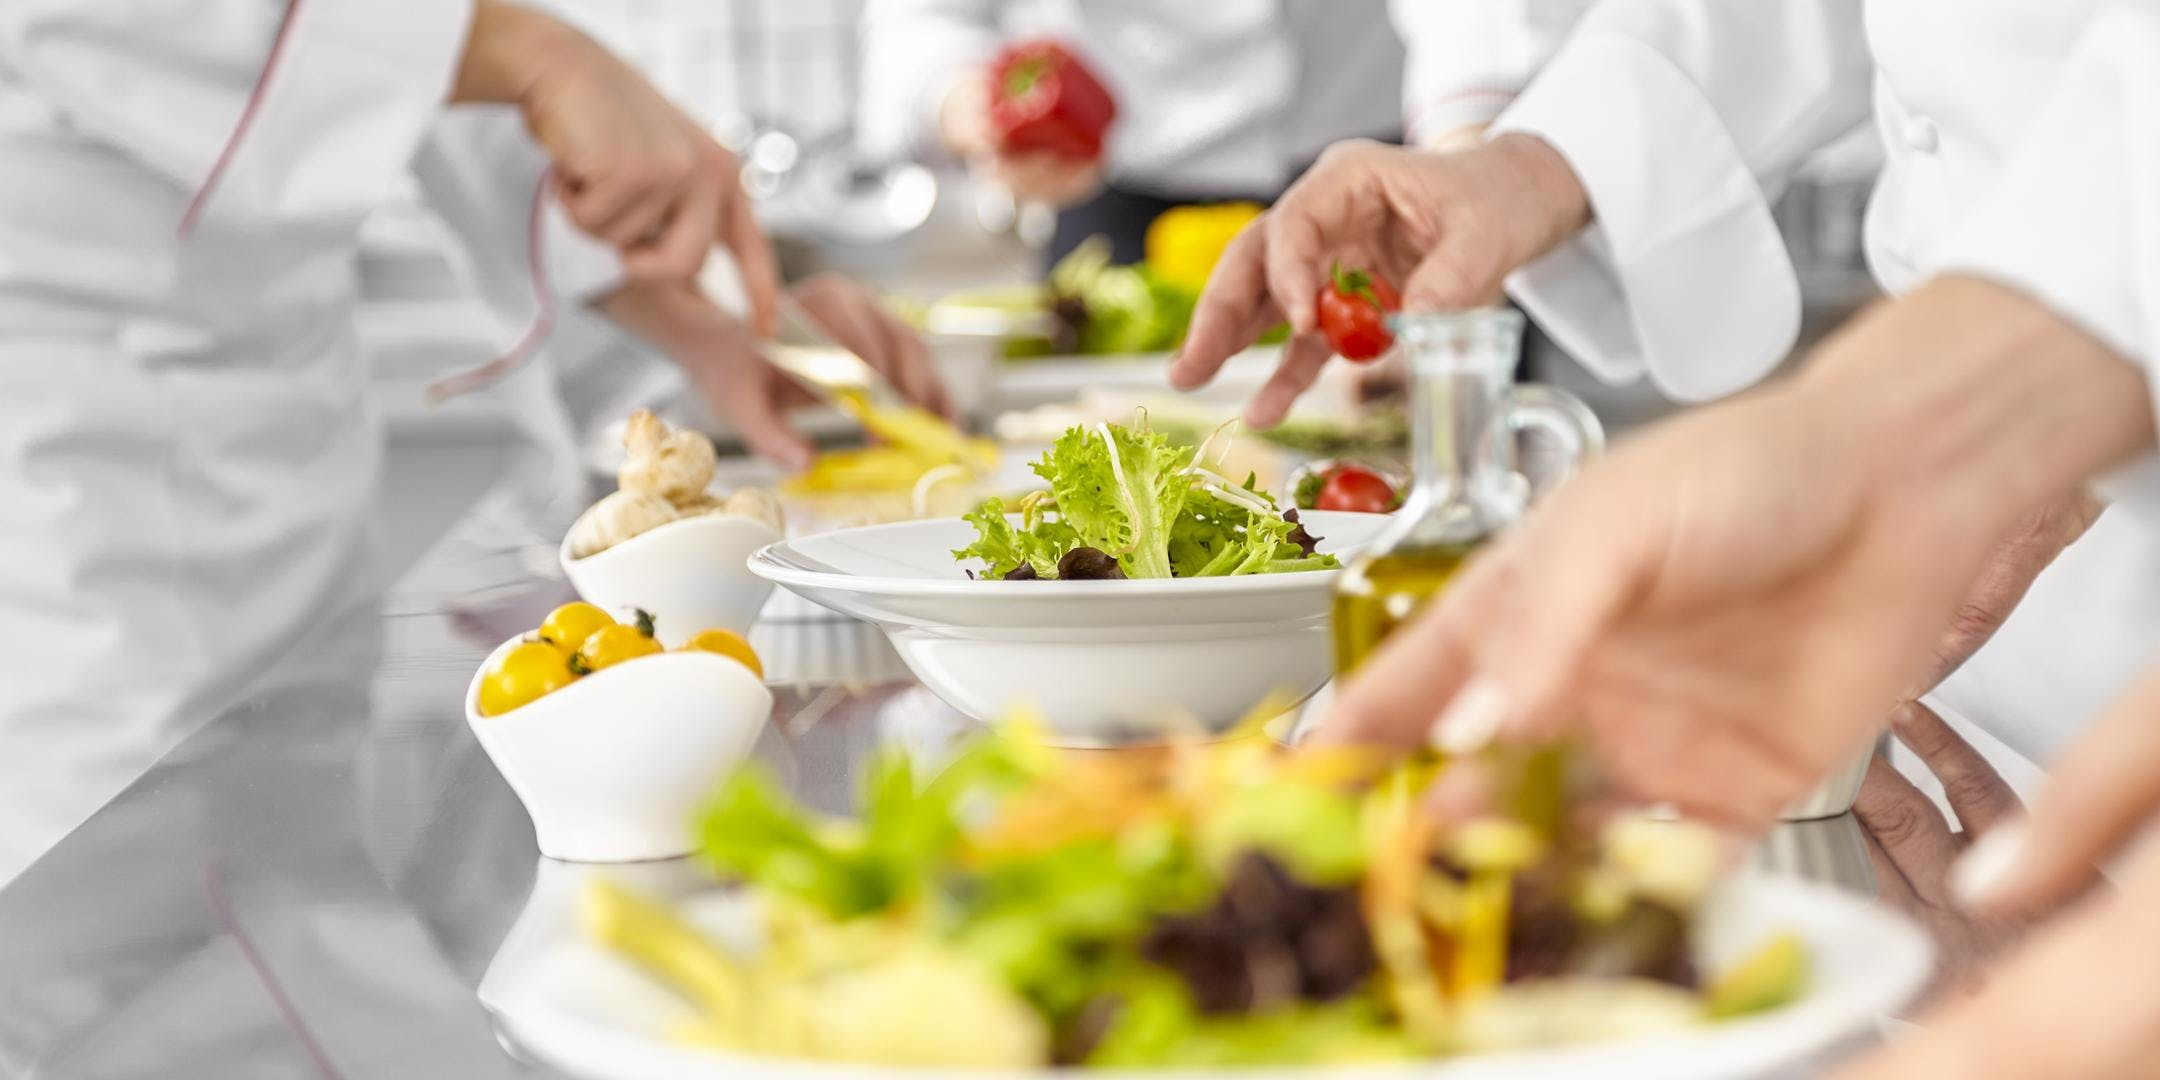 Food Handler Training Course Leeds Grenville And Lanark District